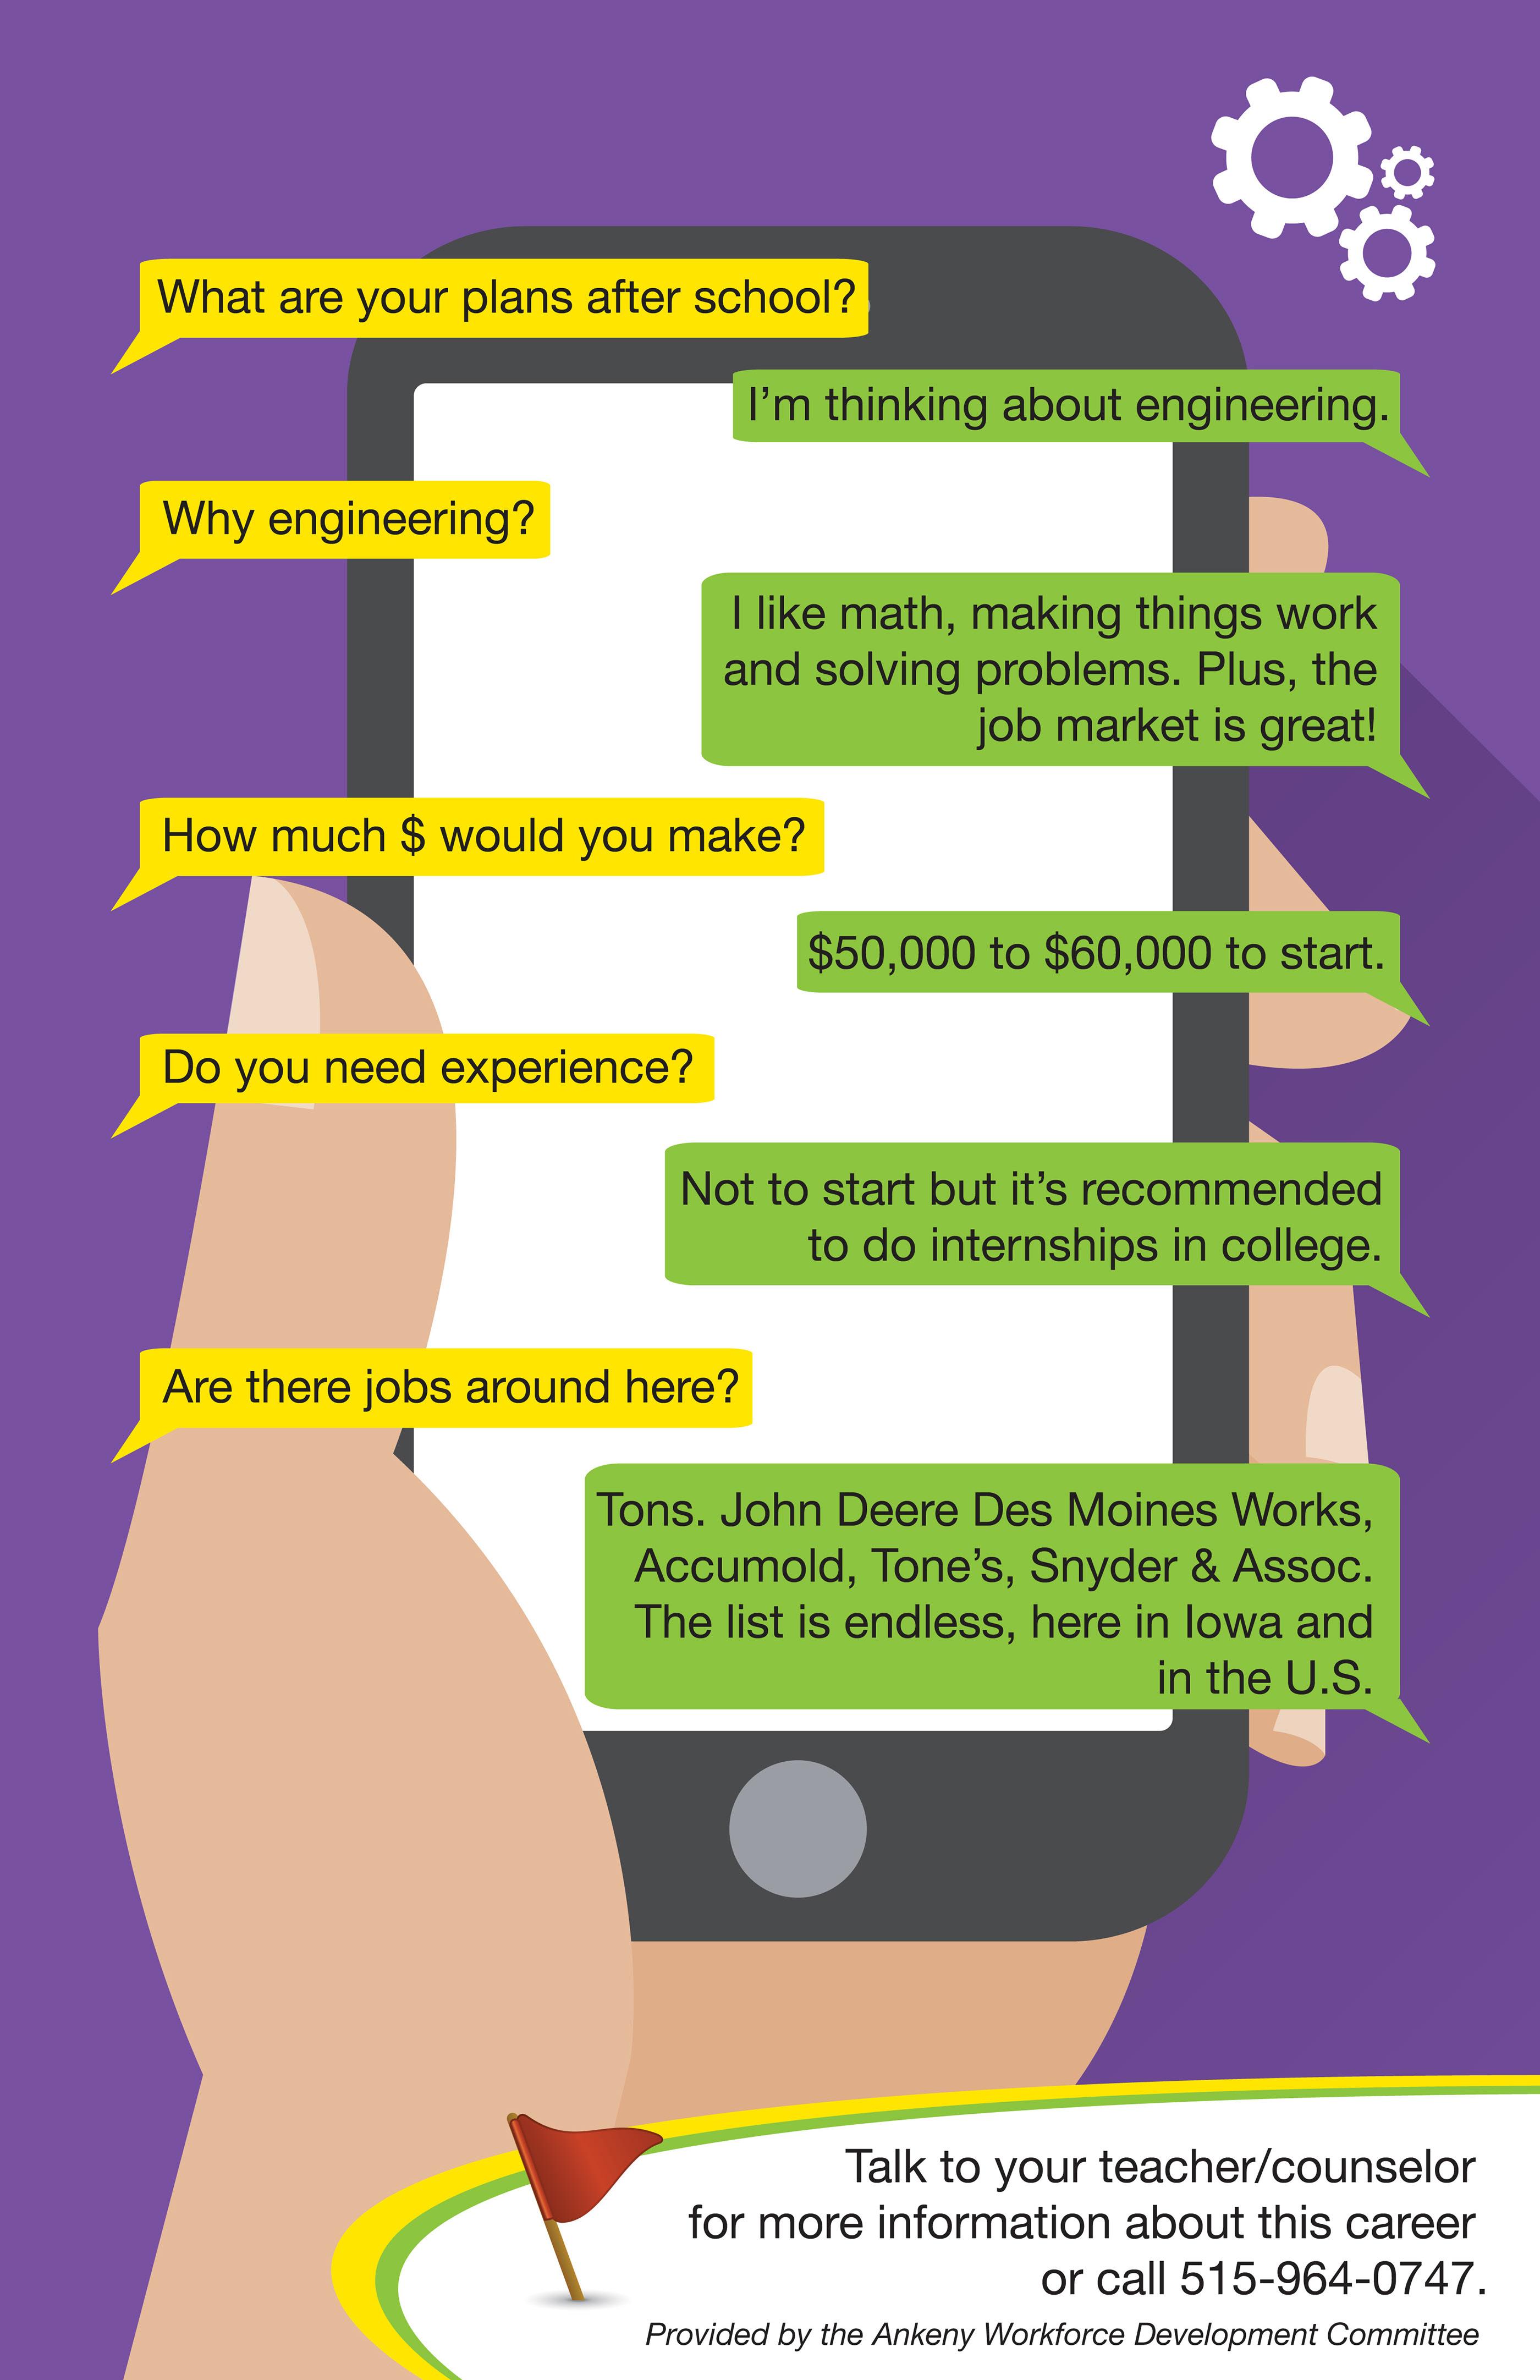 Ankeny Workforce Development Poster Series on Behance